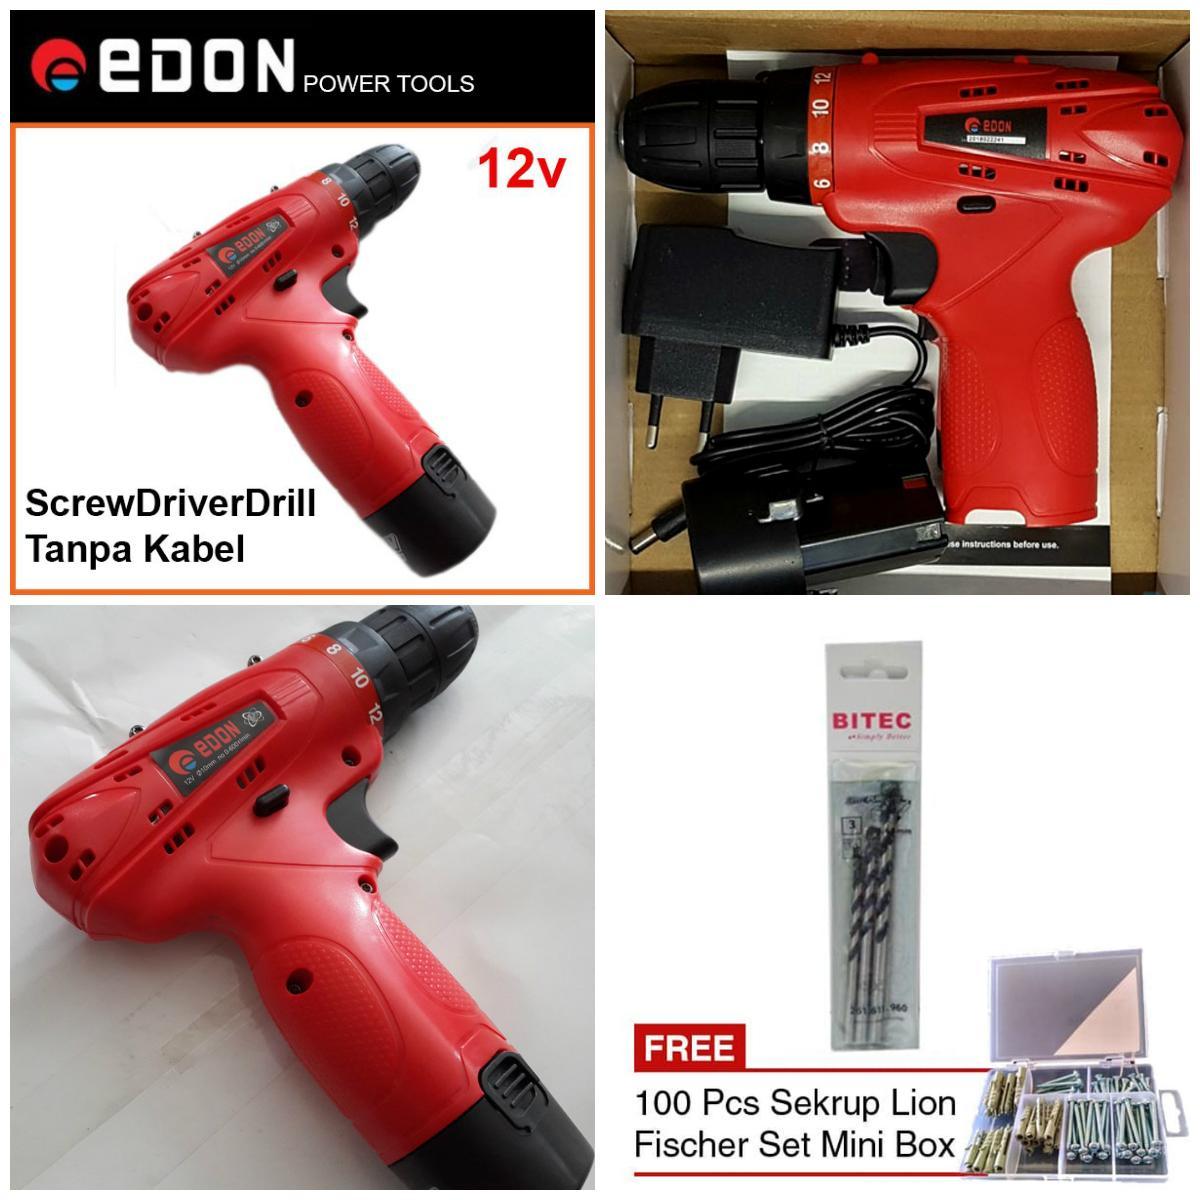 Kelebihan Mata Bor Besi Set 13 Pcs 1 5 6 5mm Kenmaster Plus Bonus Kayu Tembok Dan Obeng Fisher Paket Edon Cordless Drill Baterai Bitec 3 100pcs